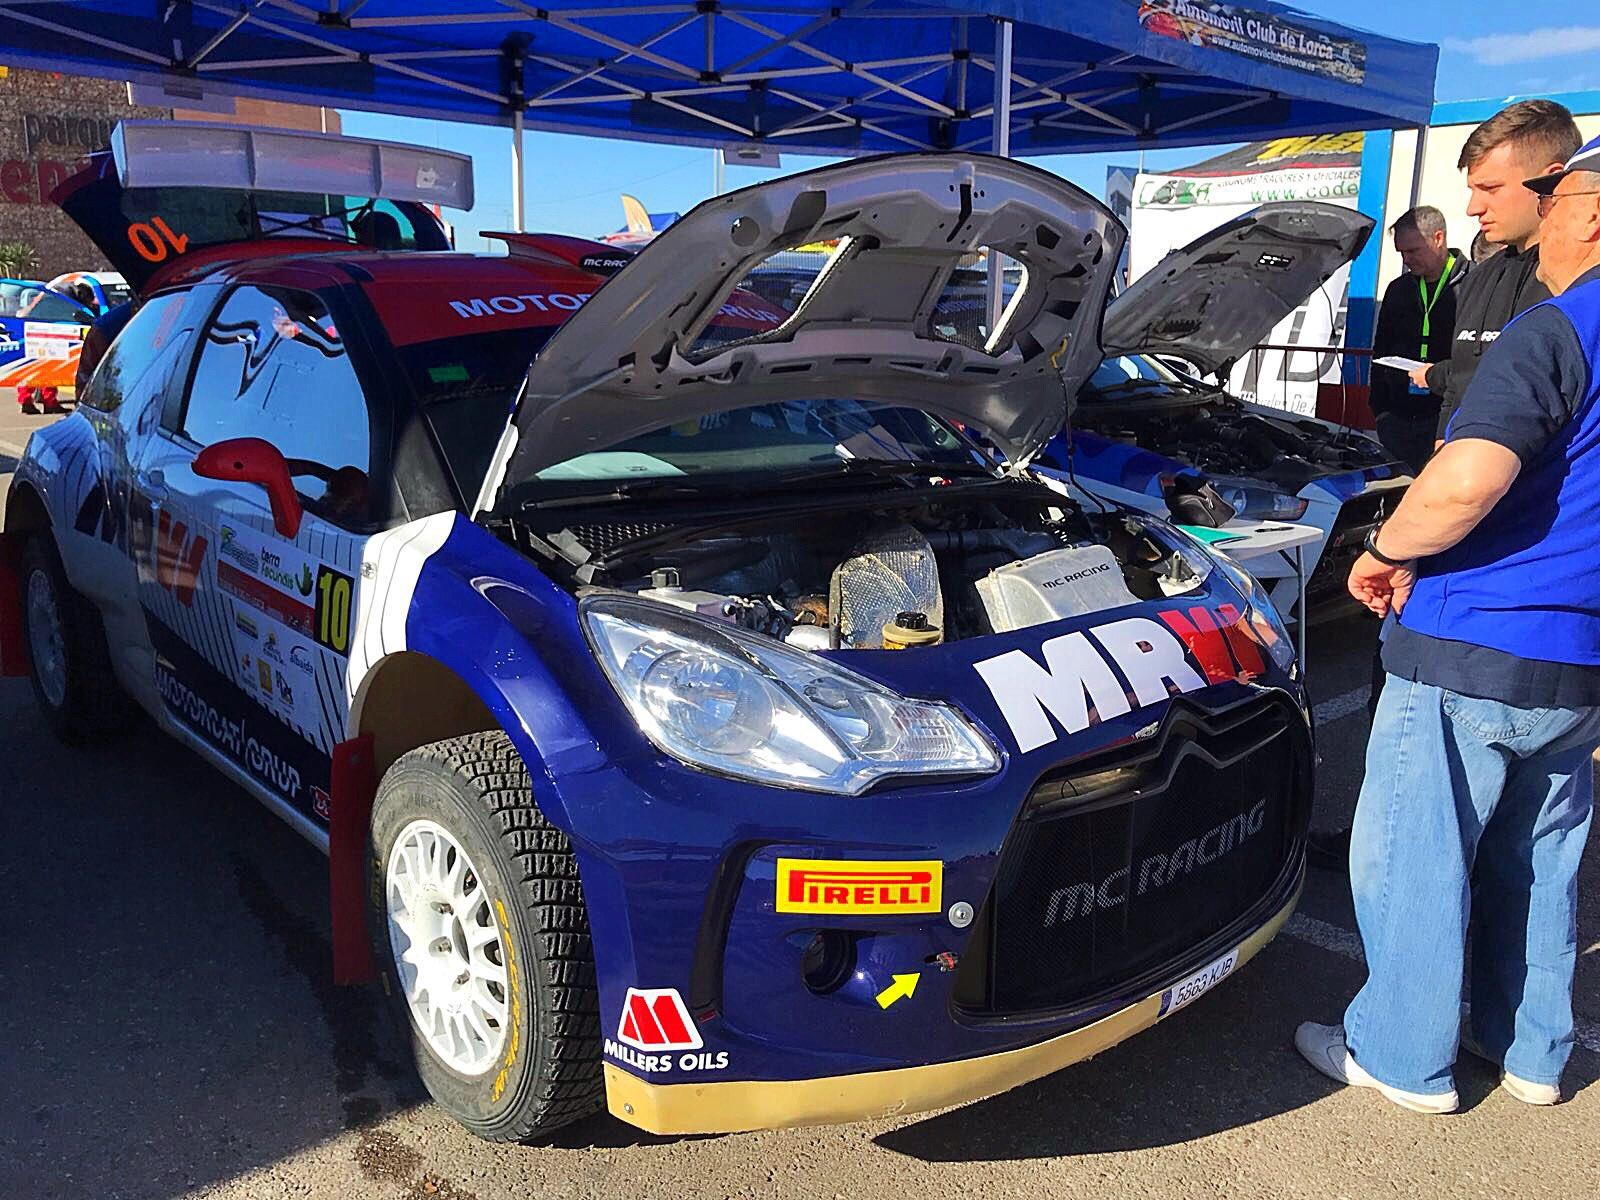 CERT: VII Rallye Tierras Altas de Lorca [9-10 Marzo] - Página 2 DX1xnvIX0AAIqgU